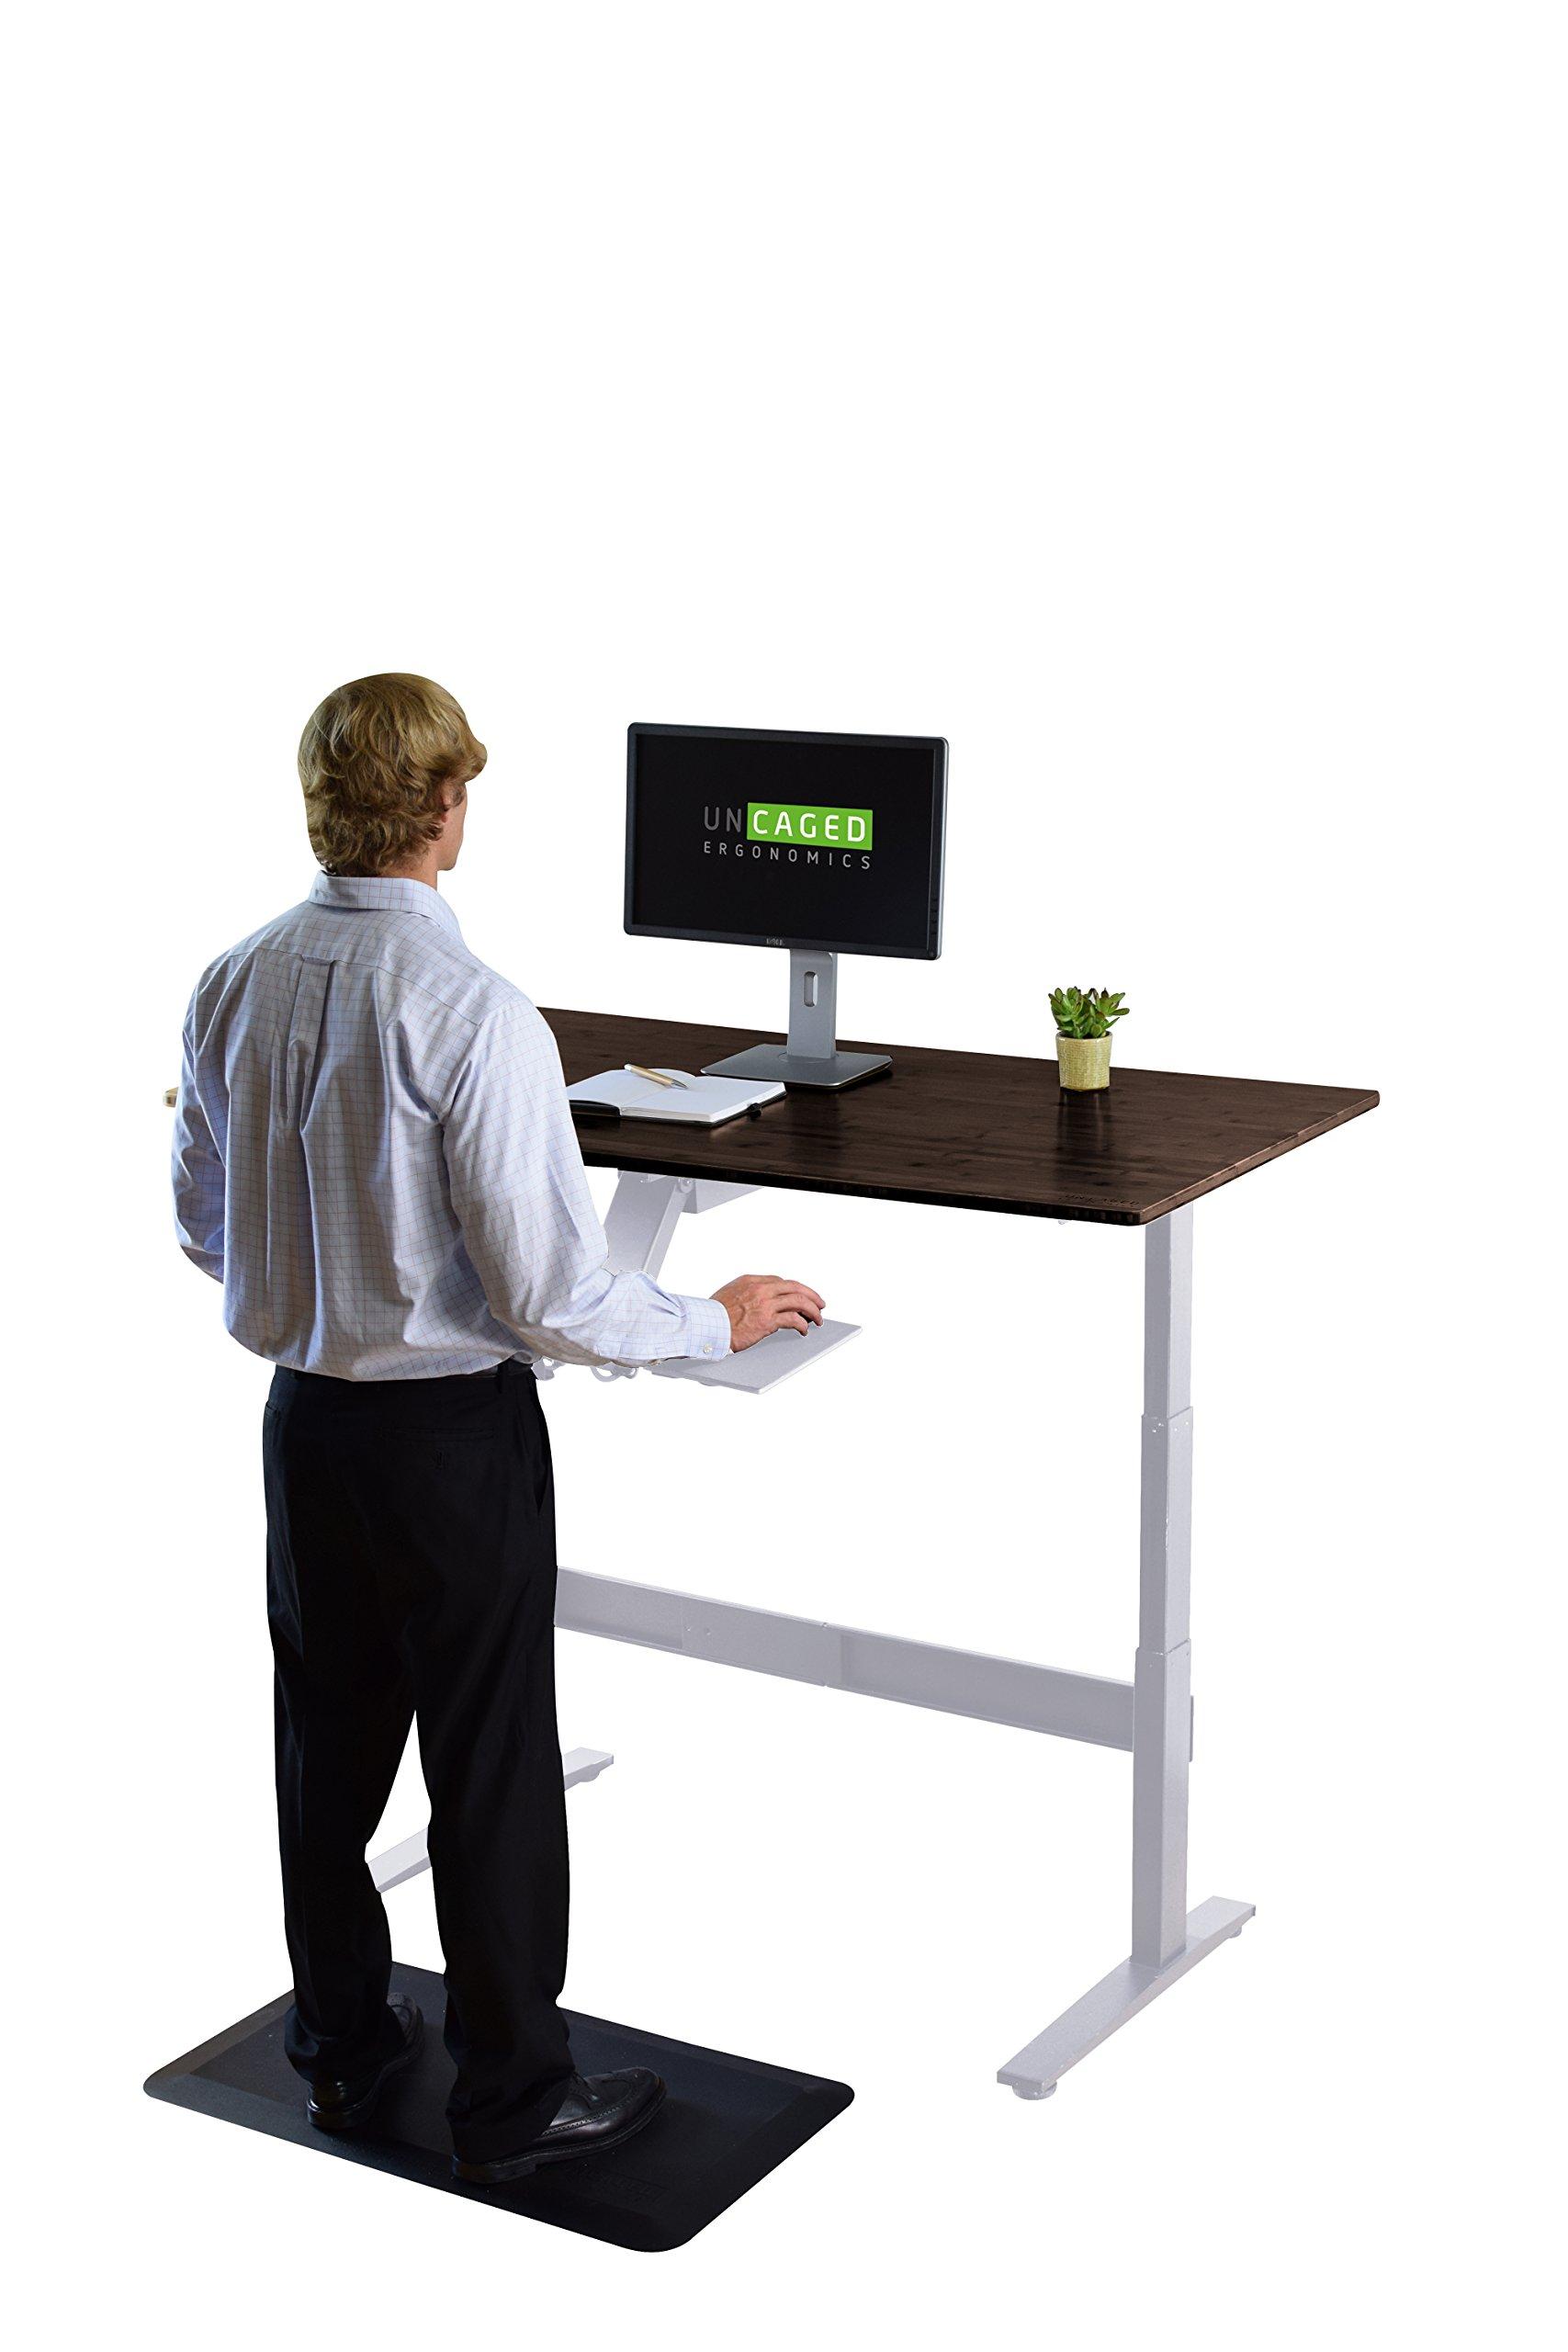 RISE UP Electric Adjustable Height Standing Desk + Beautiful Black Bamboo Desktop| Memory Keypad| 2 Motors| Affordable Ergonomic Sit Stand Office Desk by Uncaged Ergonomics (Image #5)